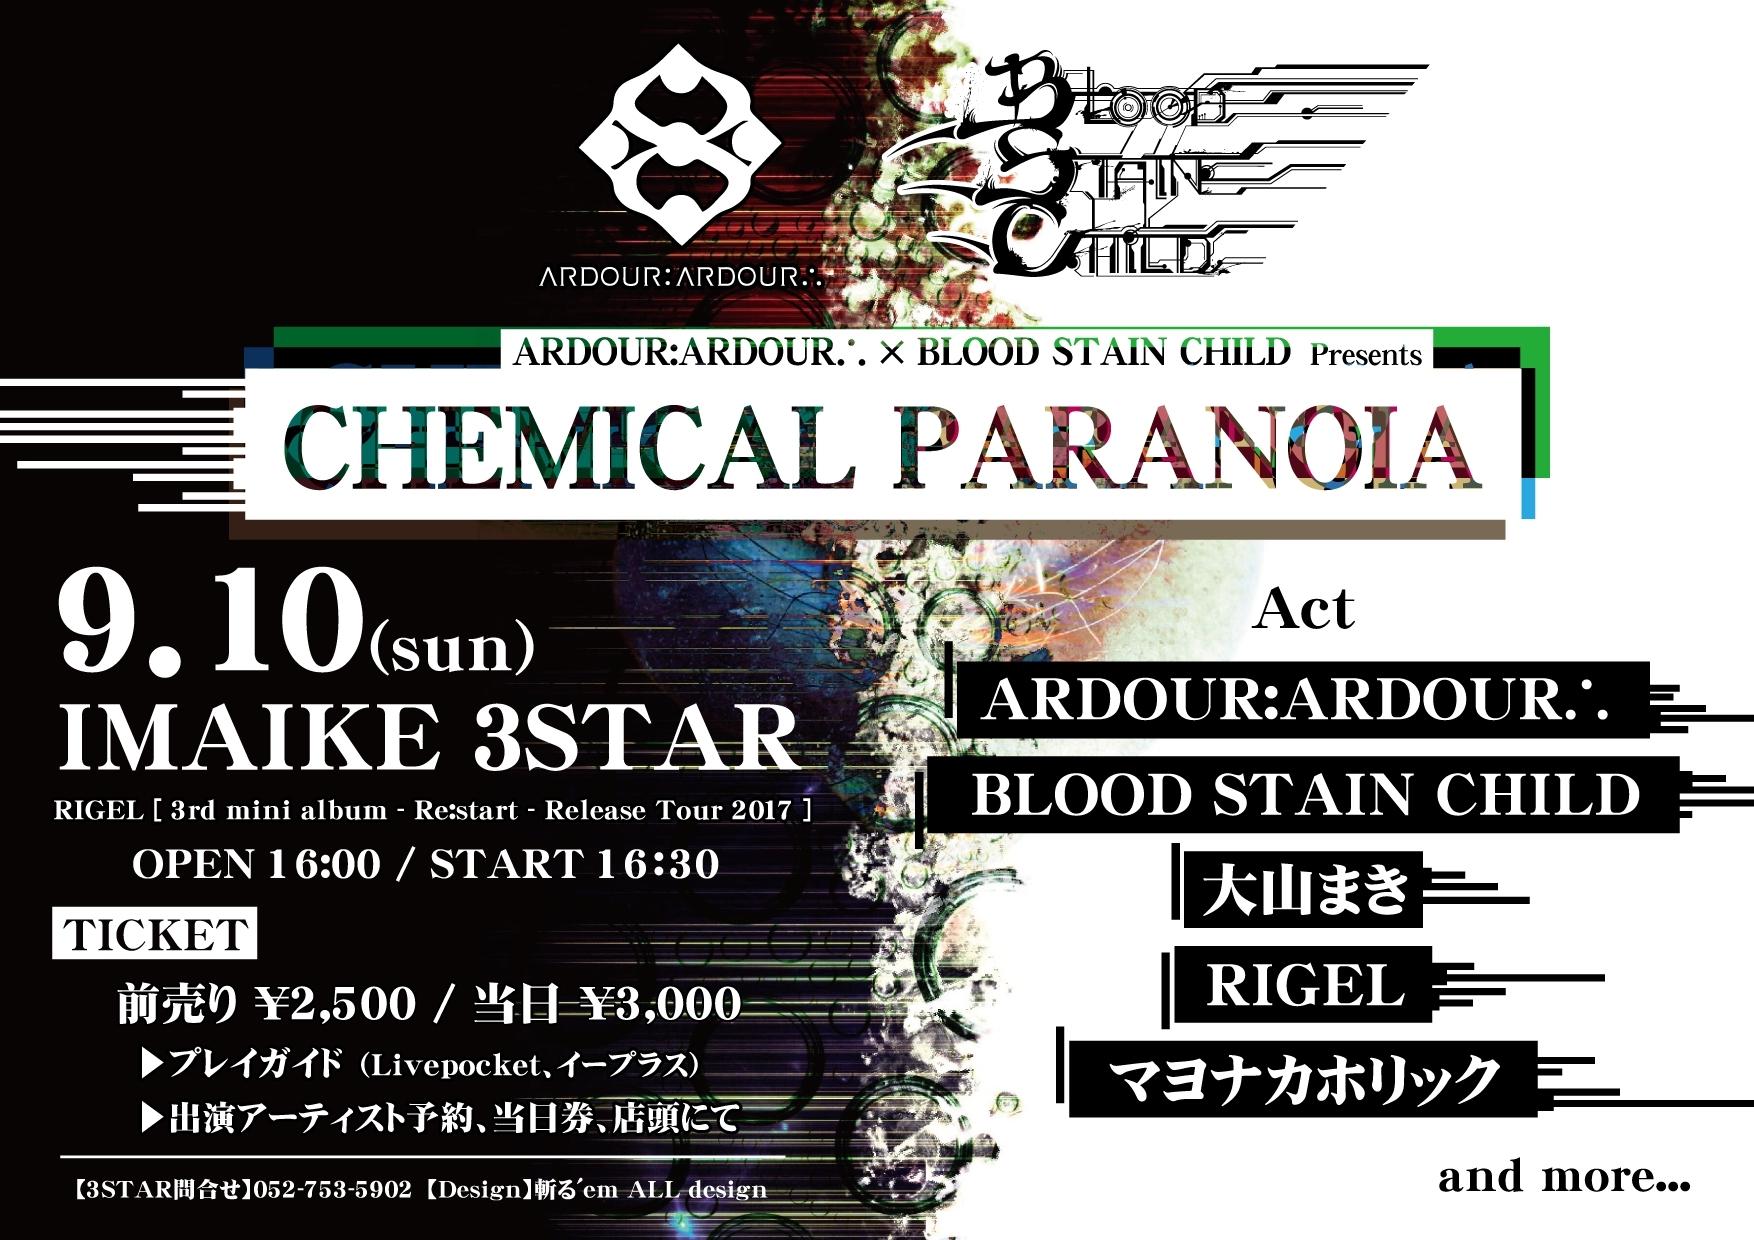 ARDOUR:ARDOUR∴ x BLOOD STAIN CHILD Presents 「CHEMICAL PARANOIA」